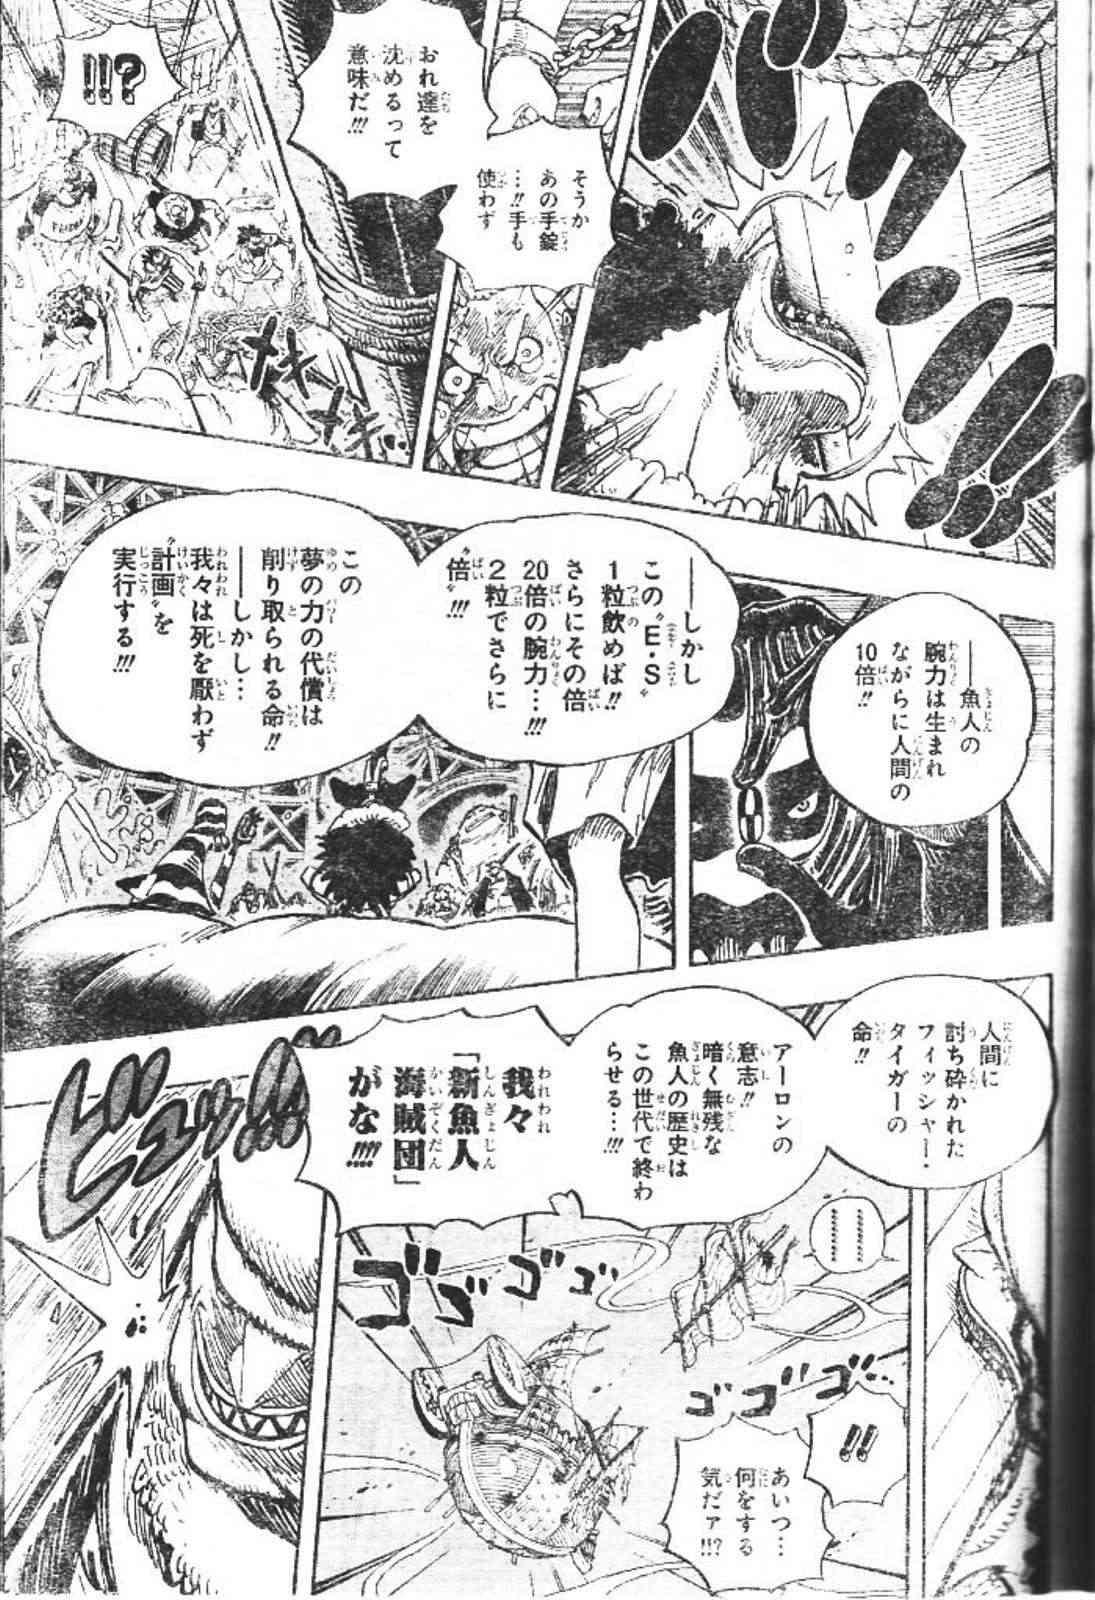 One Piece Manga 611 Spoiler Pics 15_raw10